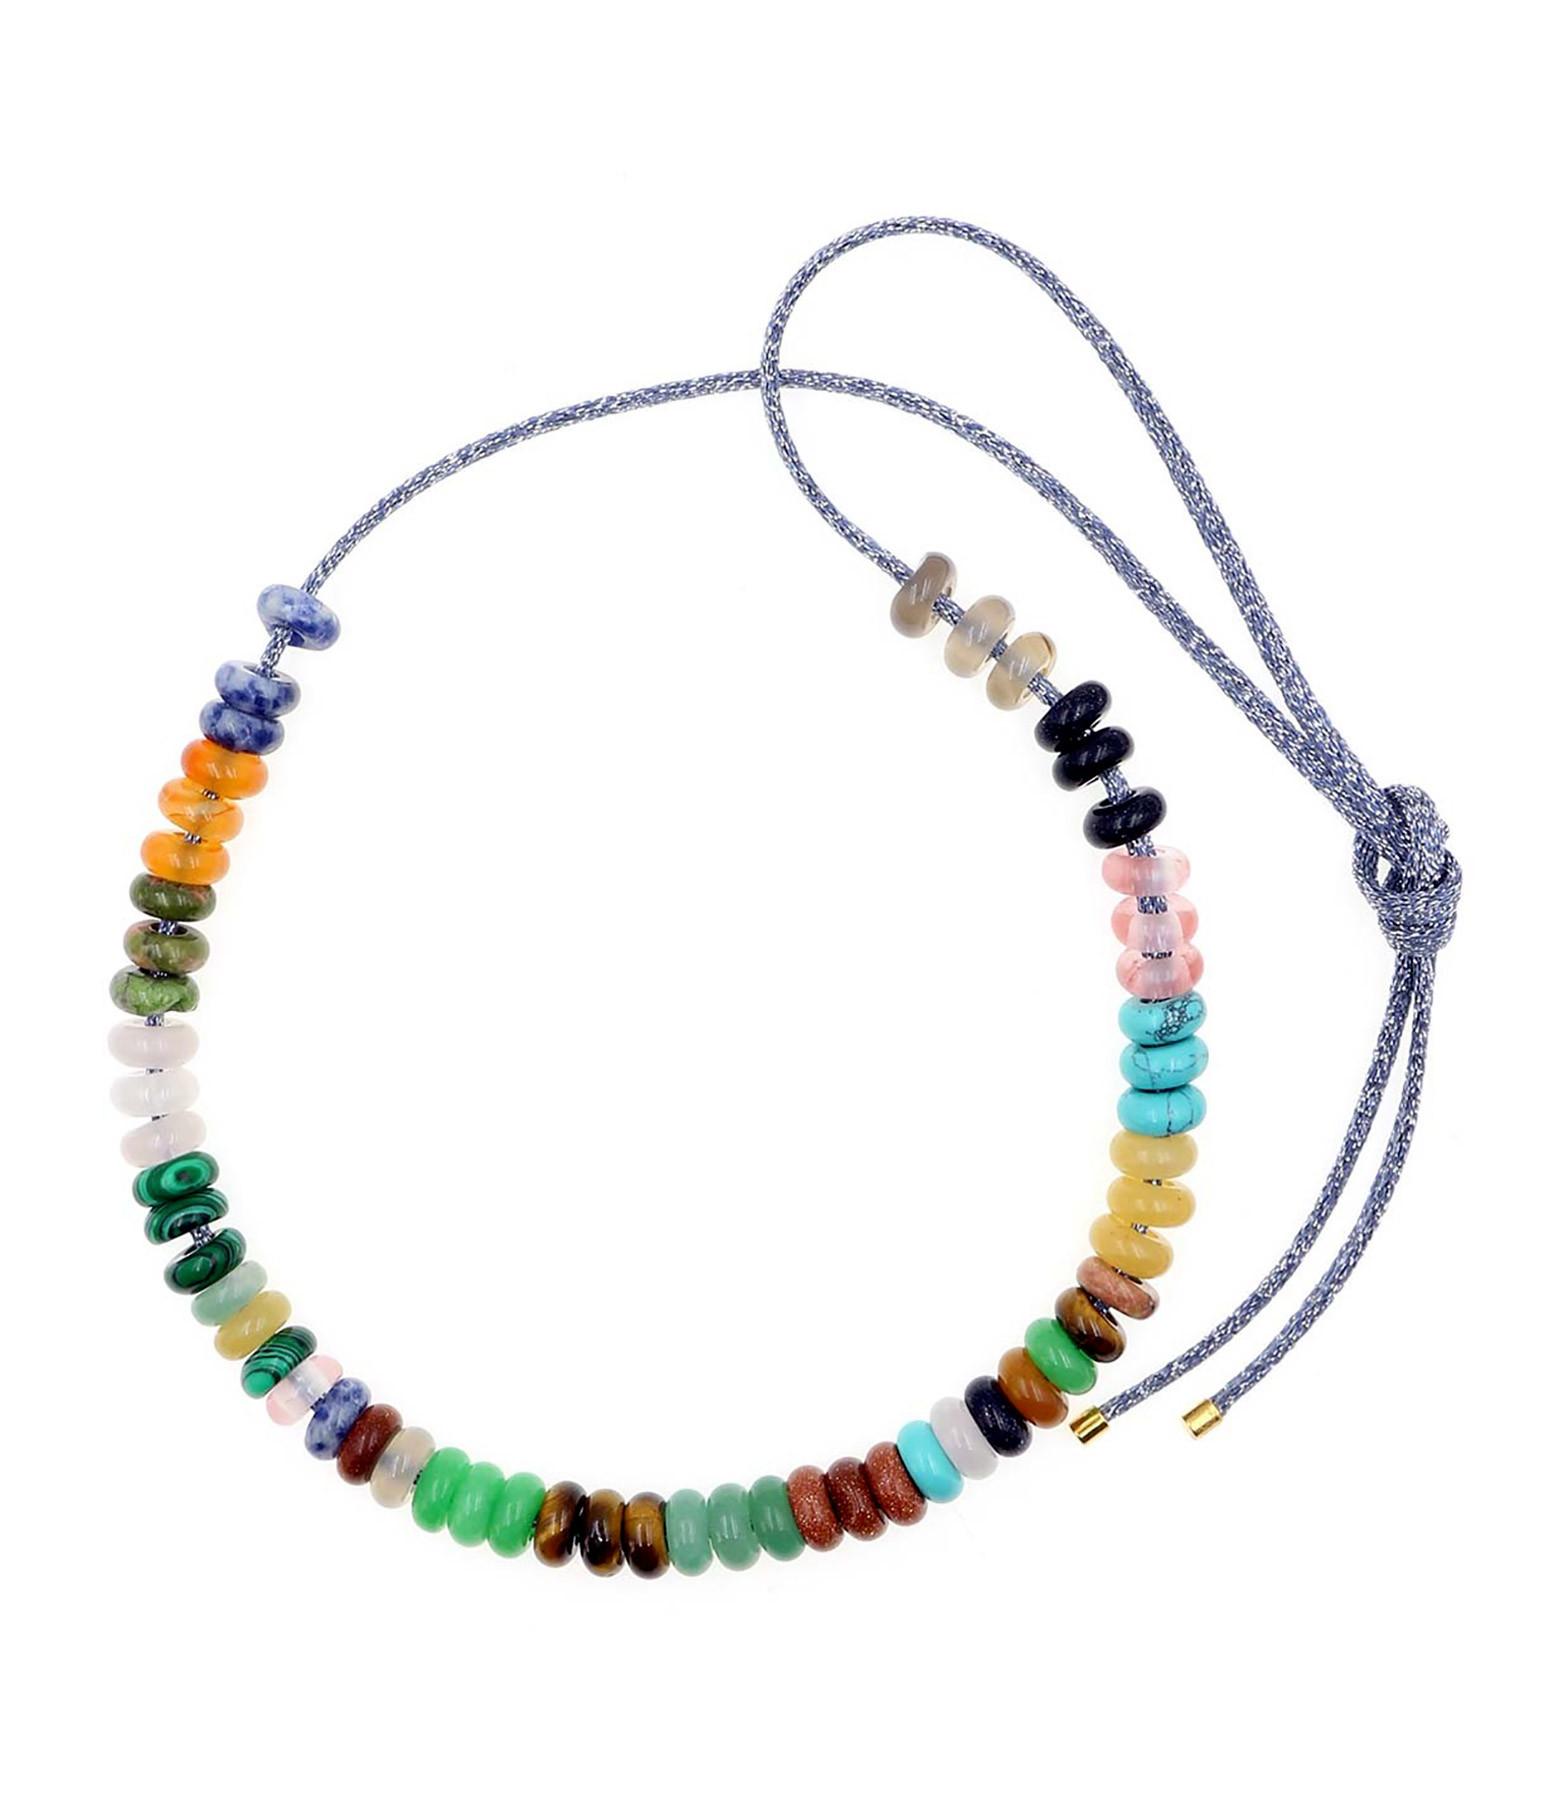 MON PRECIEUX GEM - Sautoir Grosses Perles Pierres Multicolore